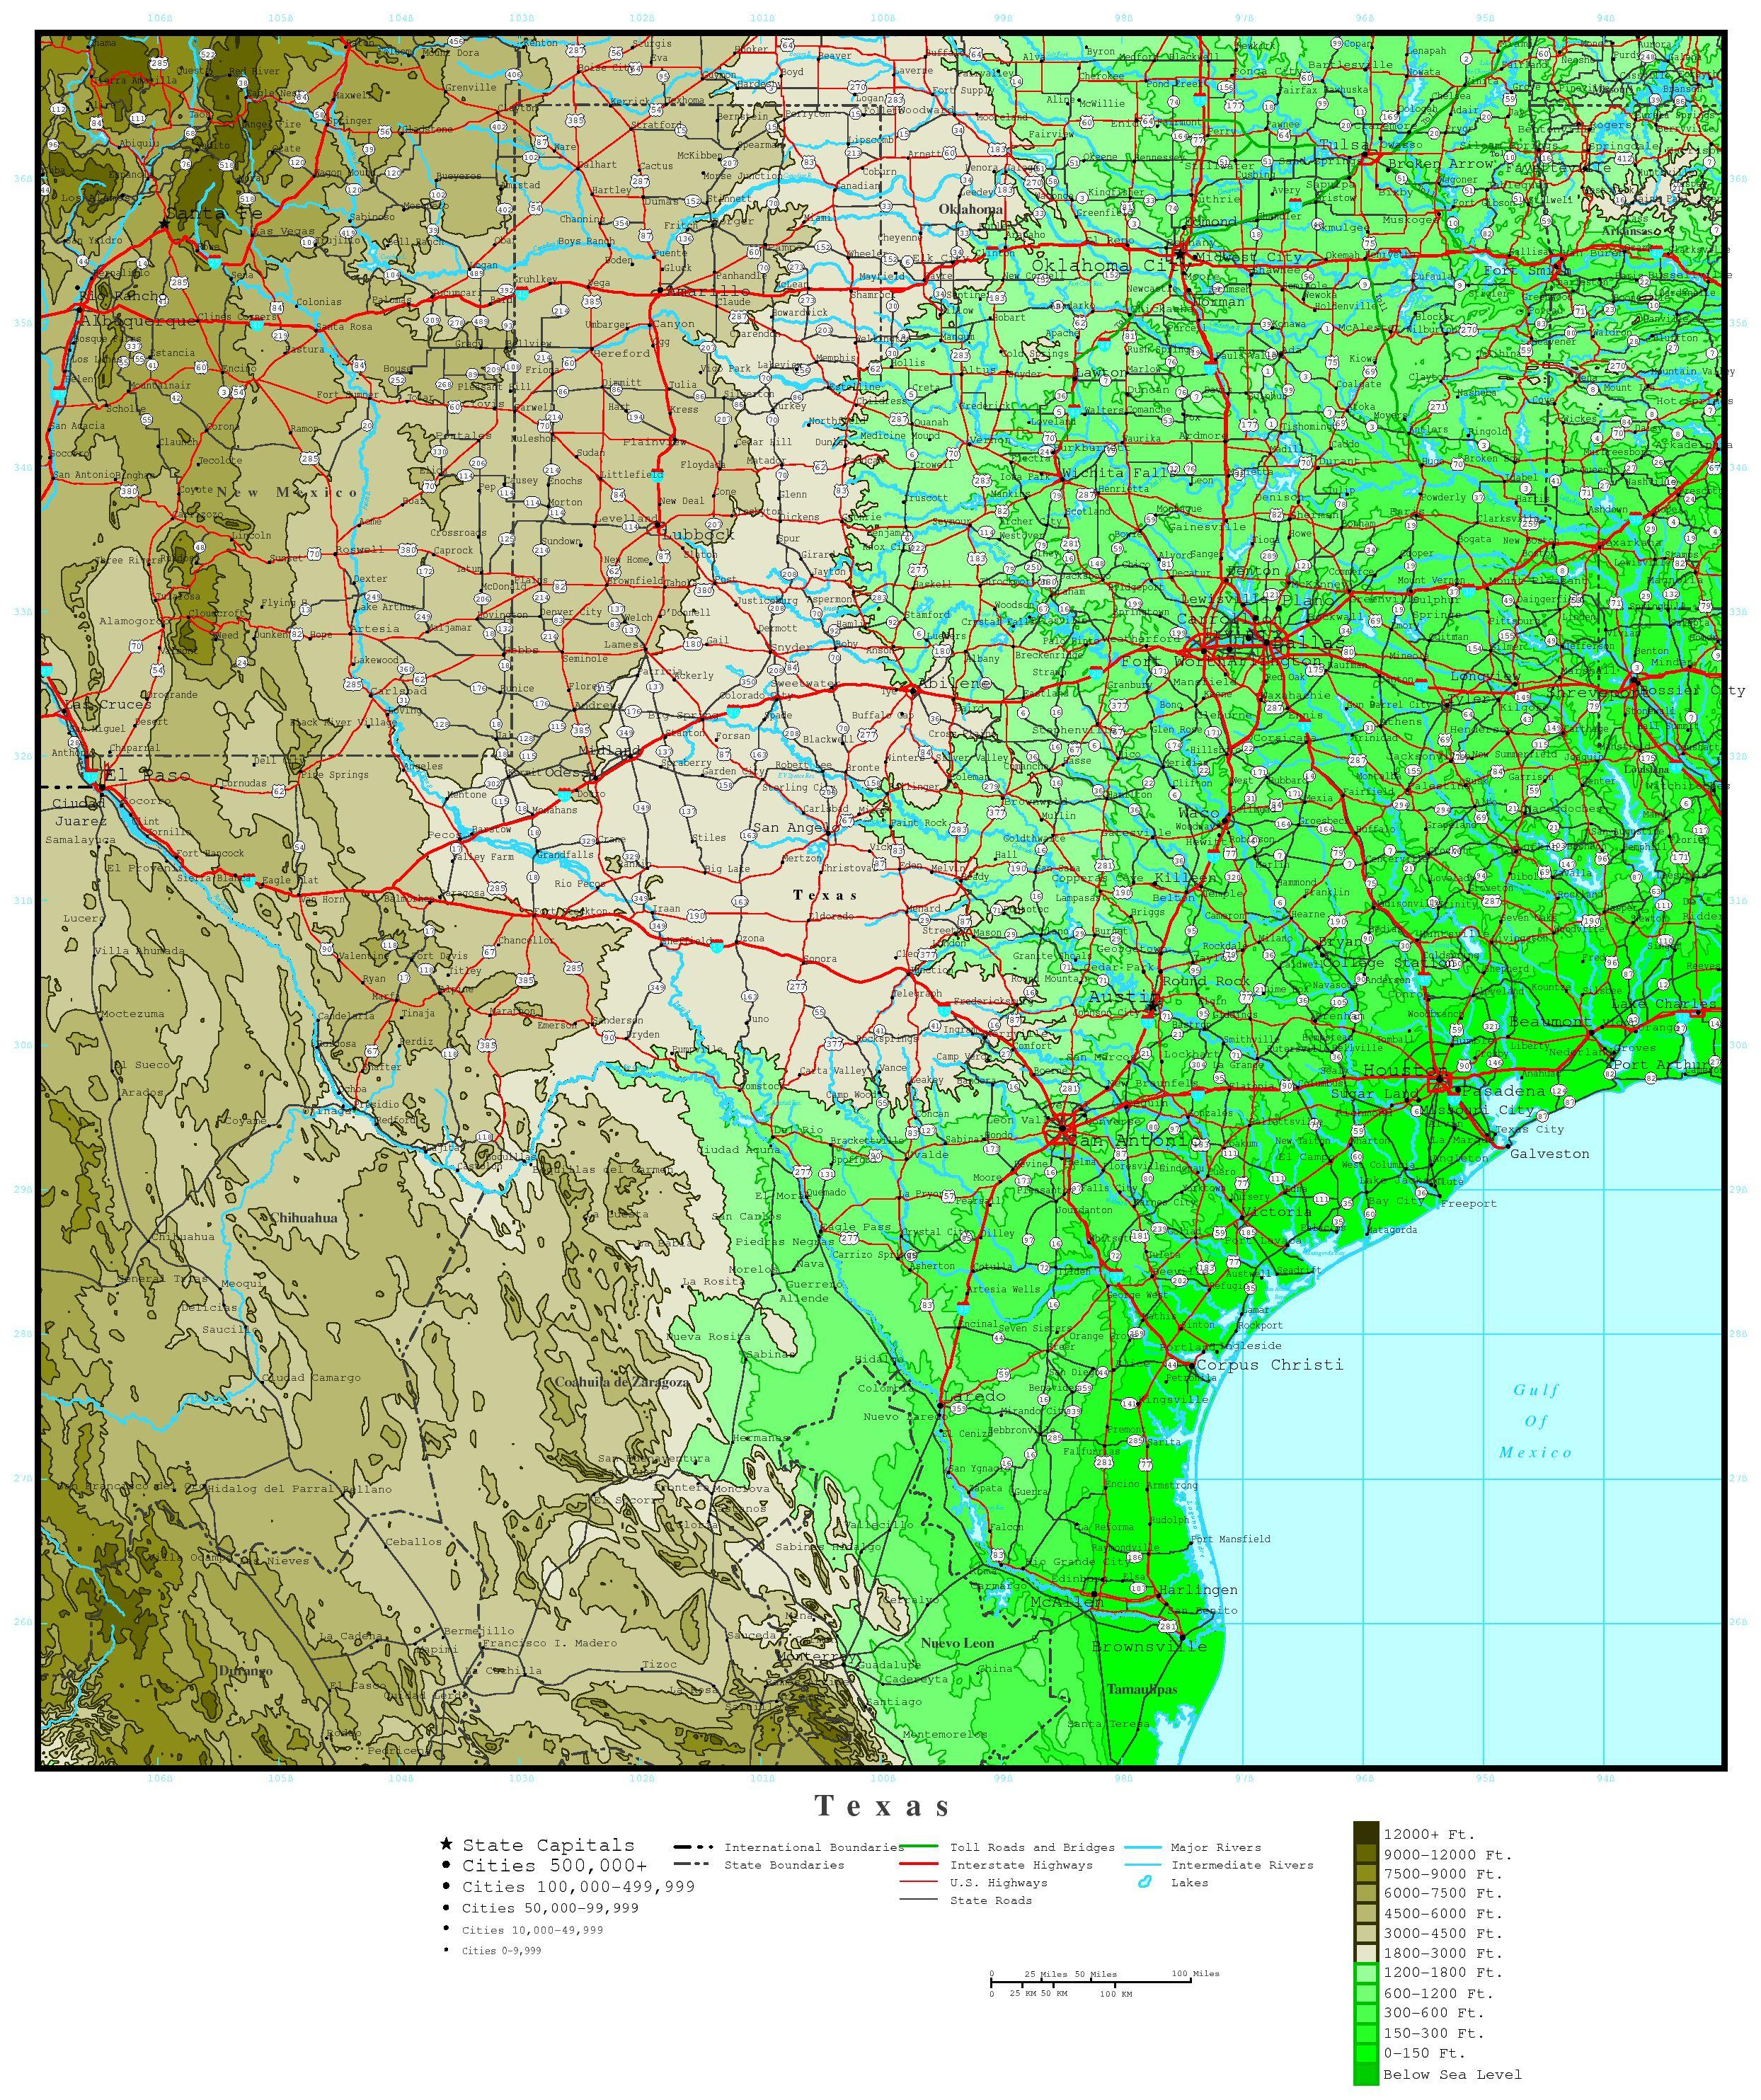 Texas Elevation Map - Texas Topo Map